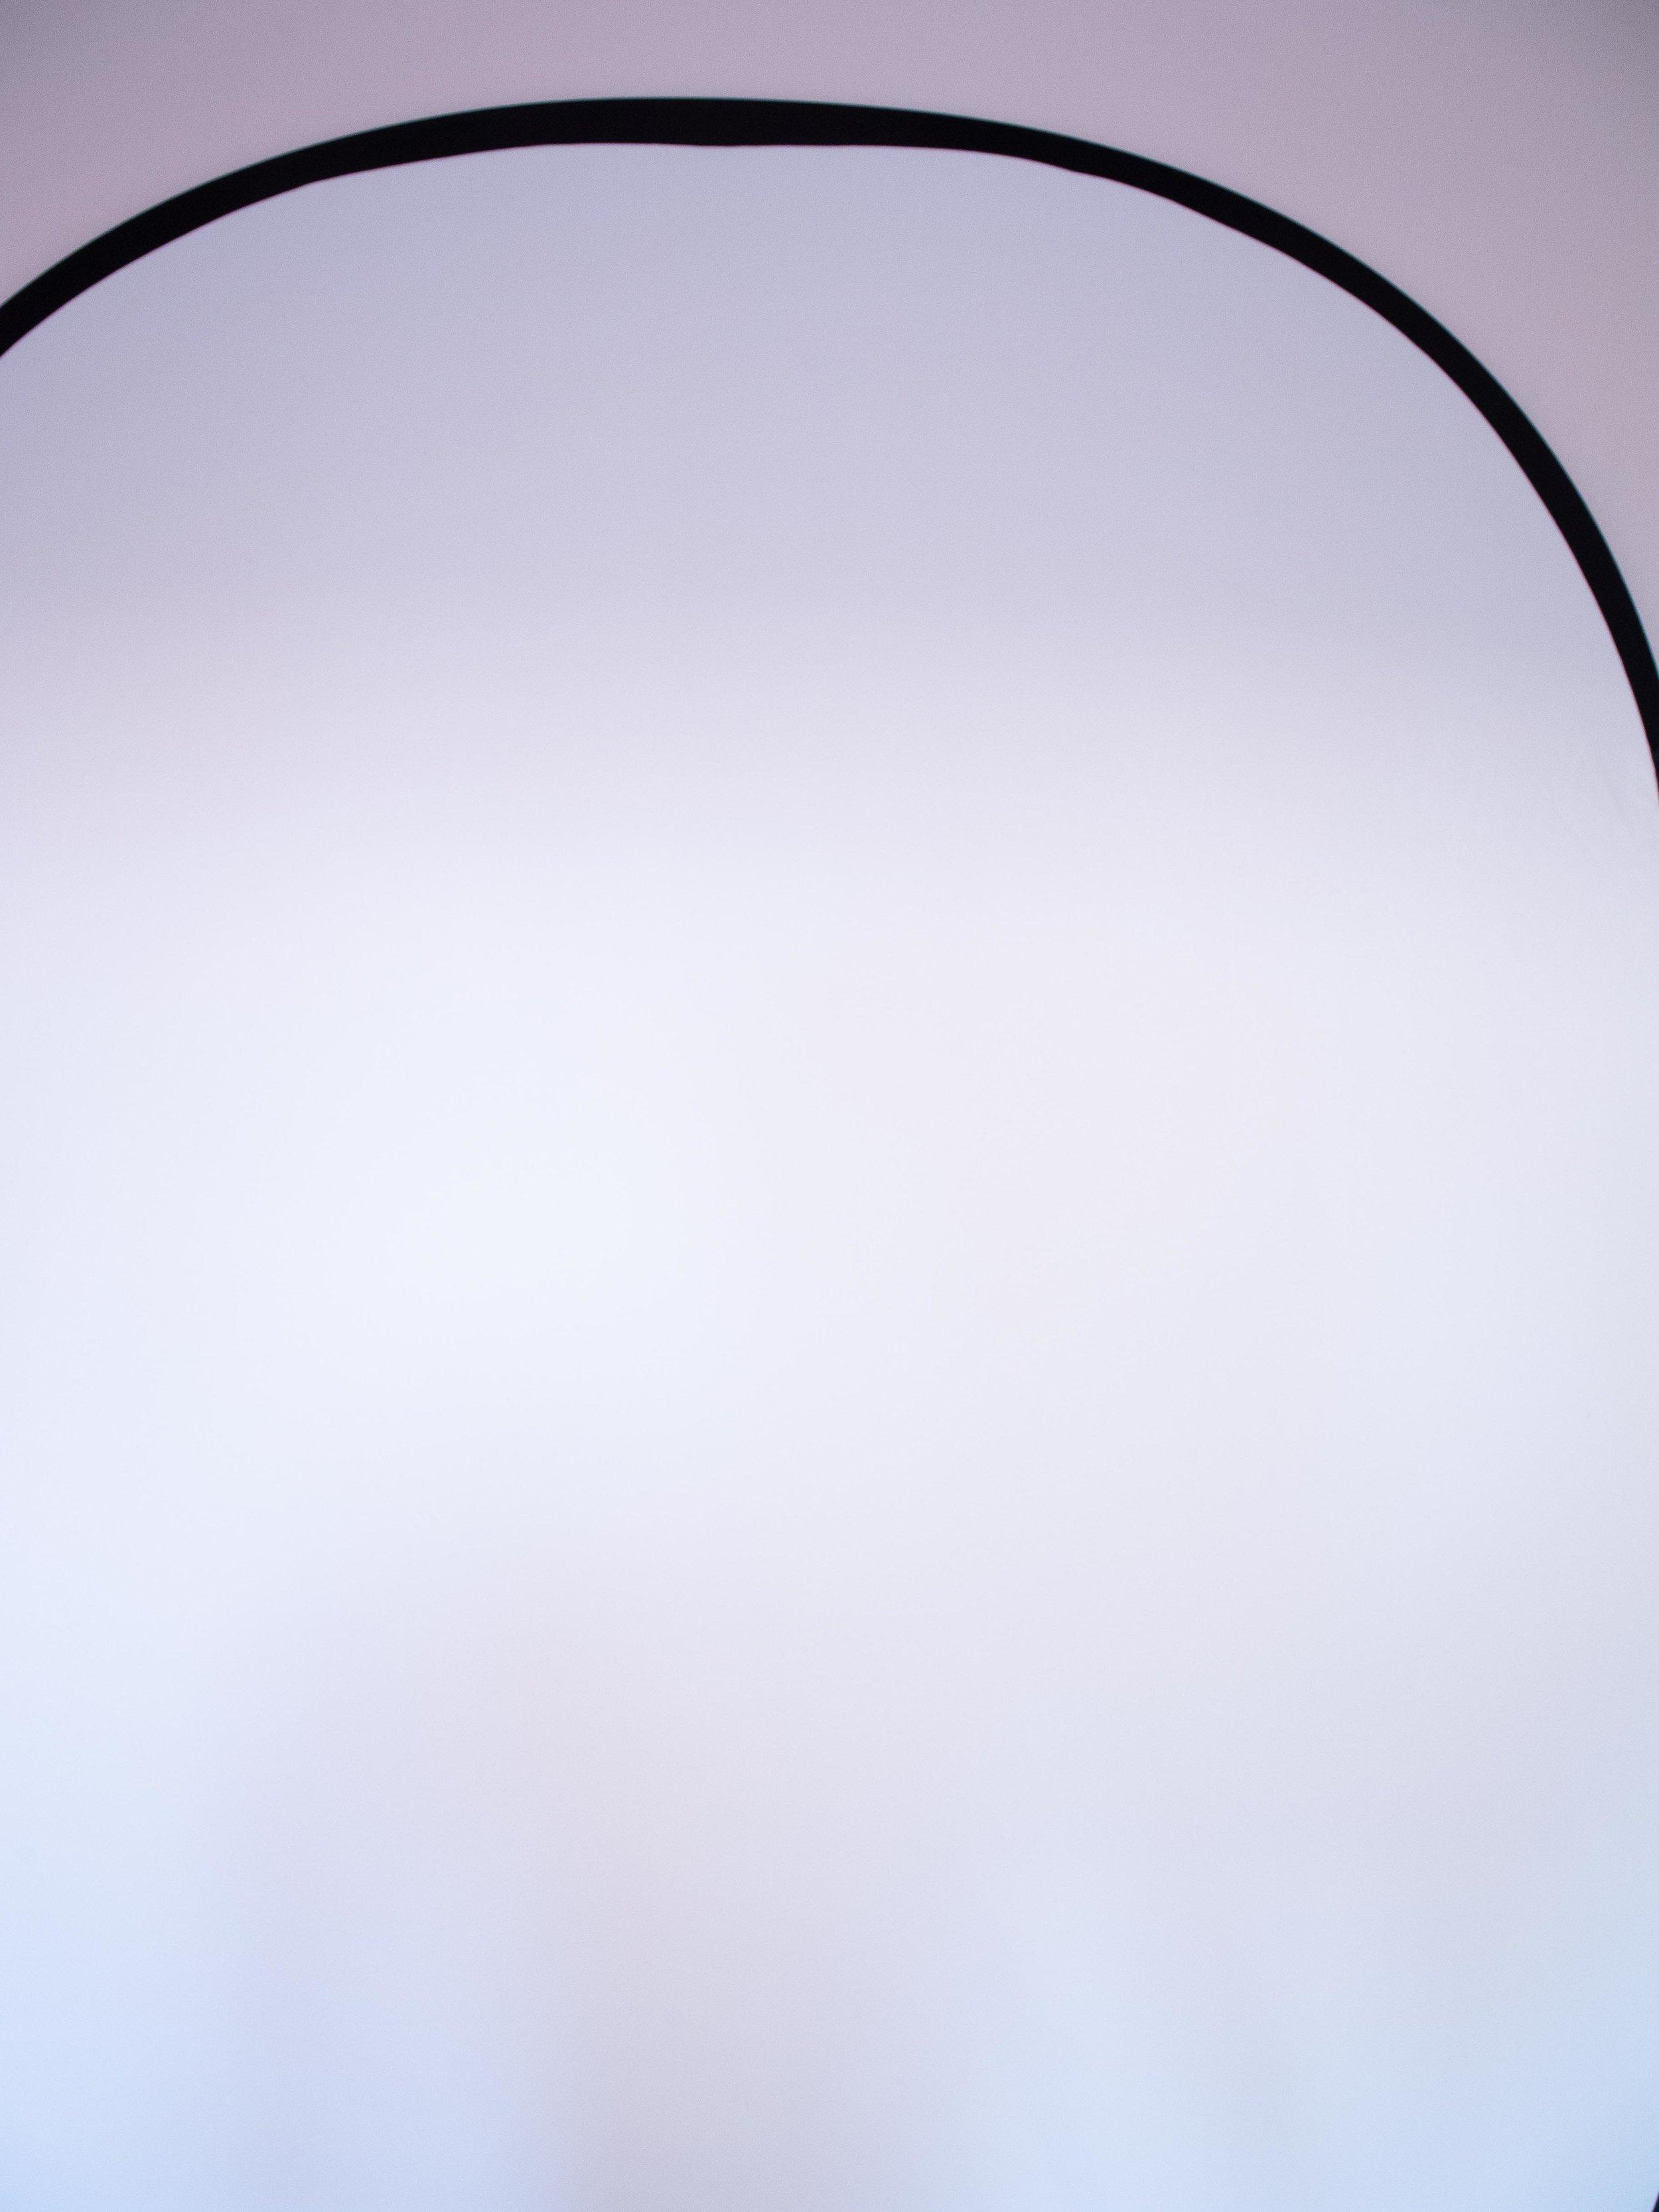 Filter Test Cokin vs 84.5mm (2 of 6).jpg